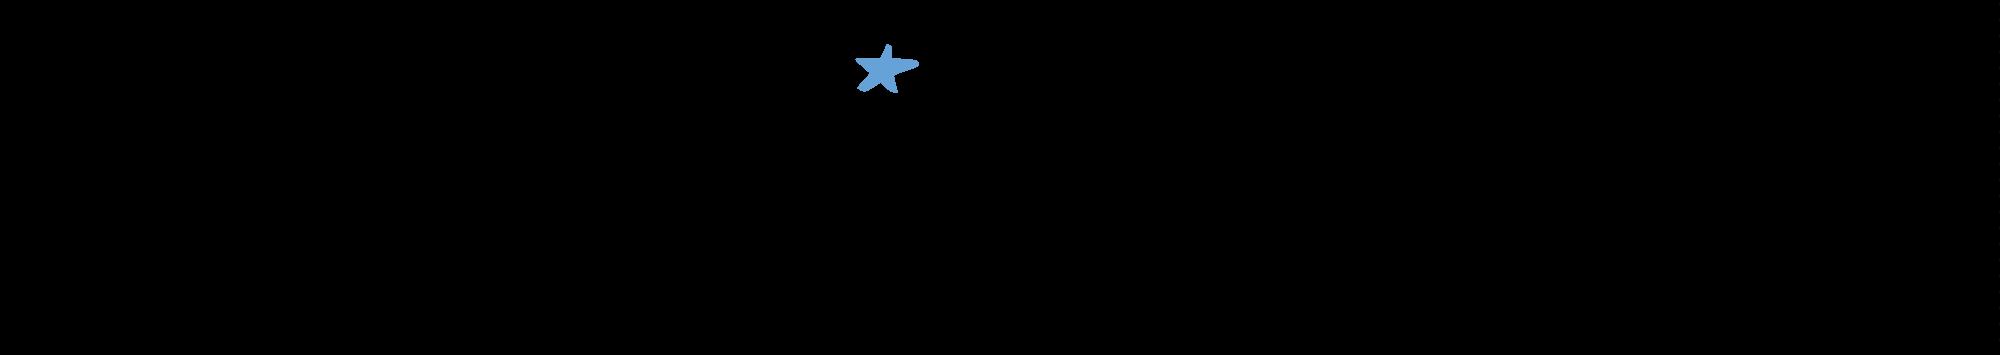 ABF-Logo-TAGLINE-Color-BlueStar-HORIZONTAL.png